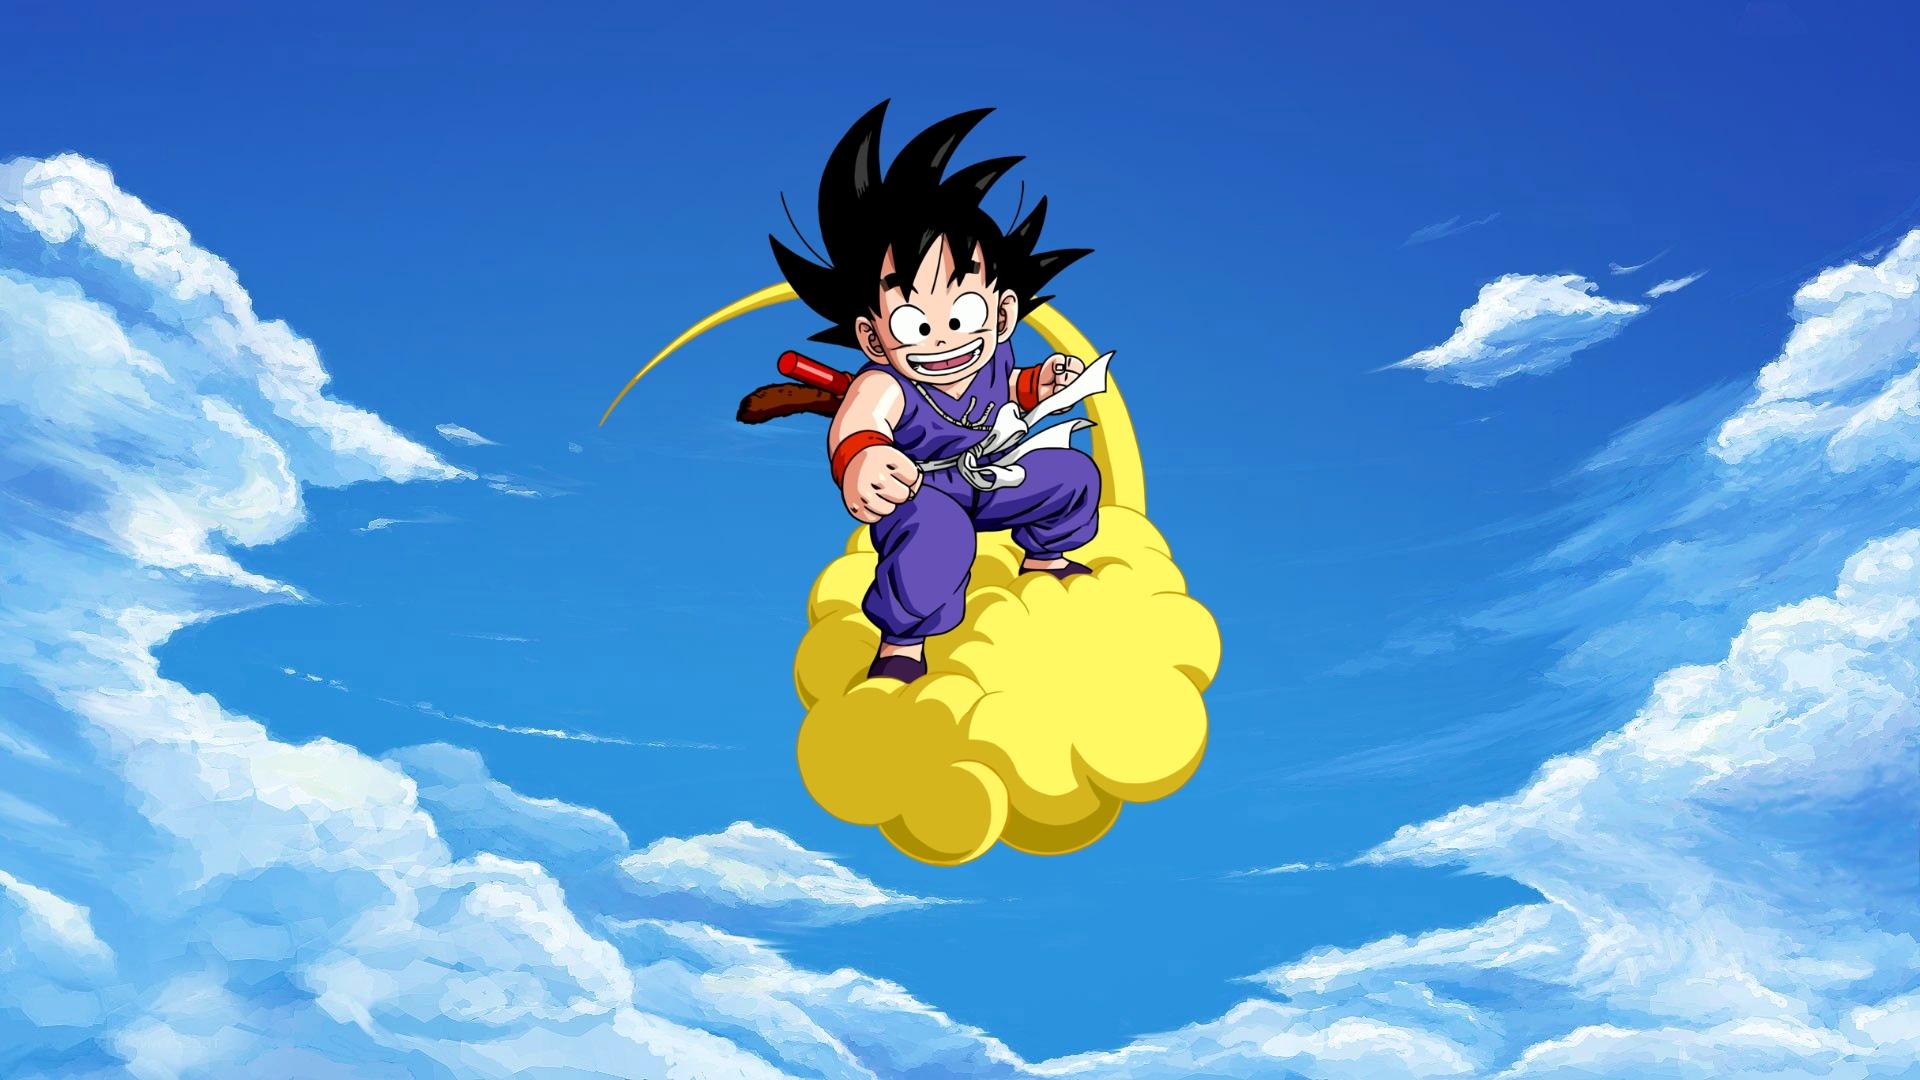 Kid Goku Wallpaper 1920x1080